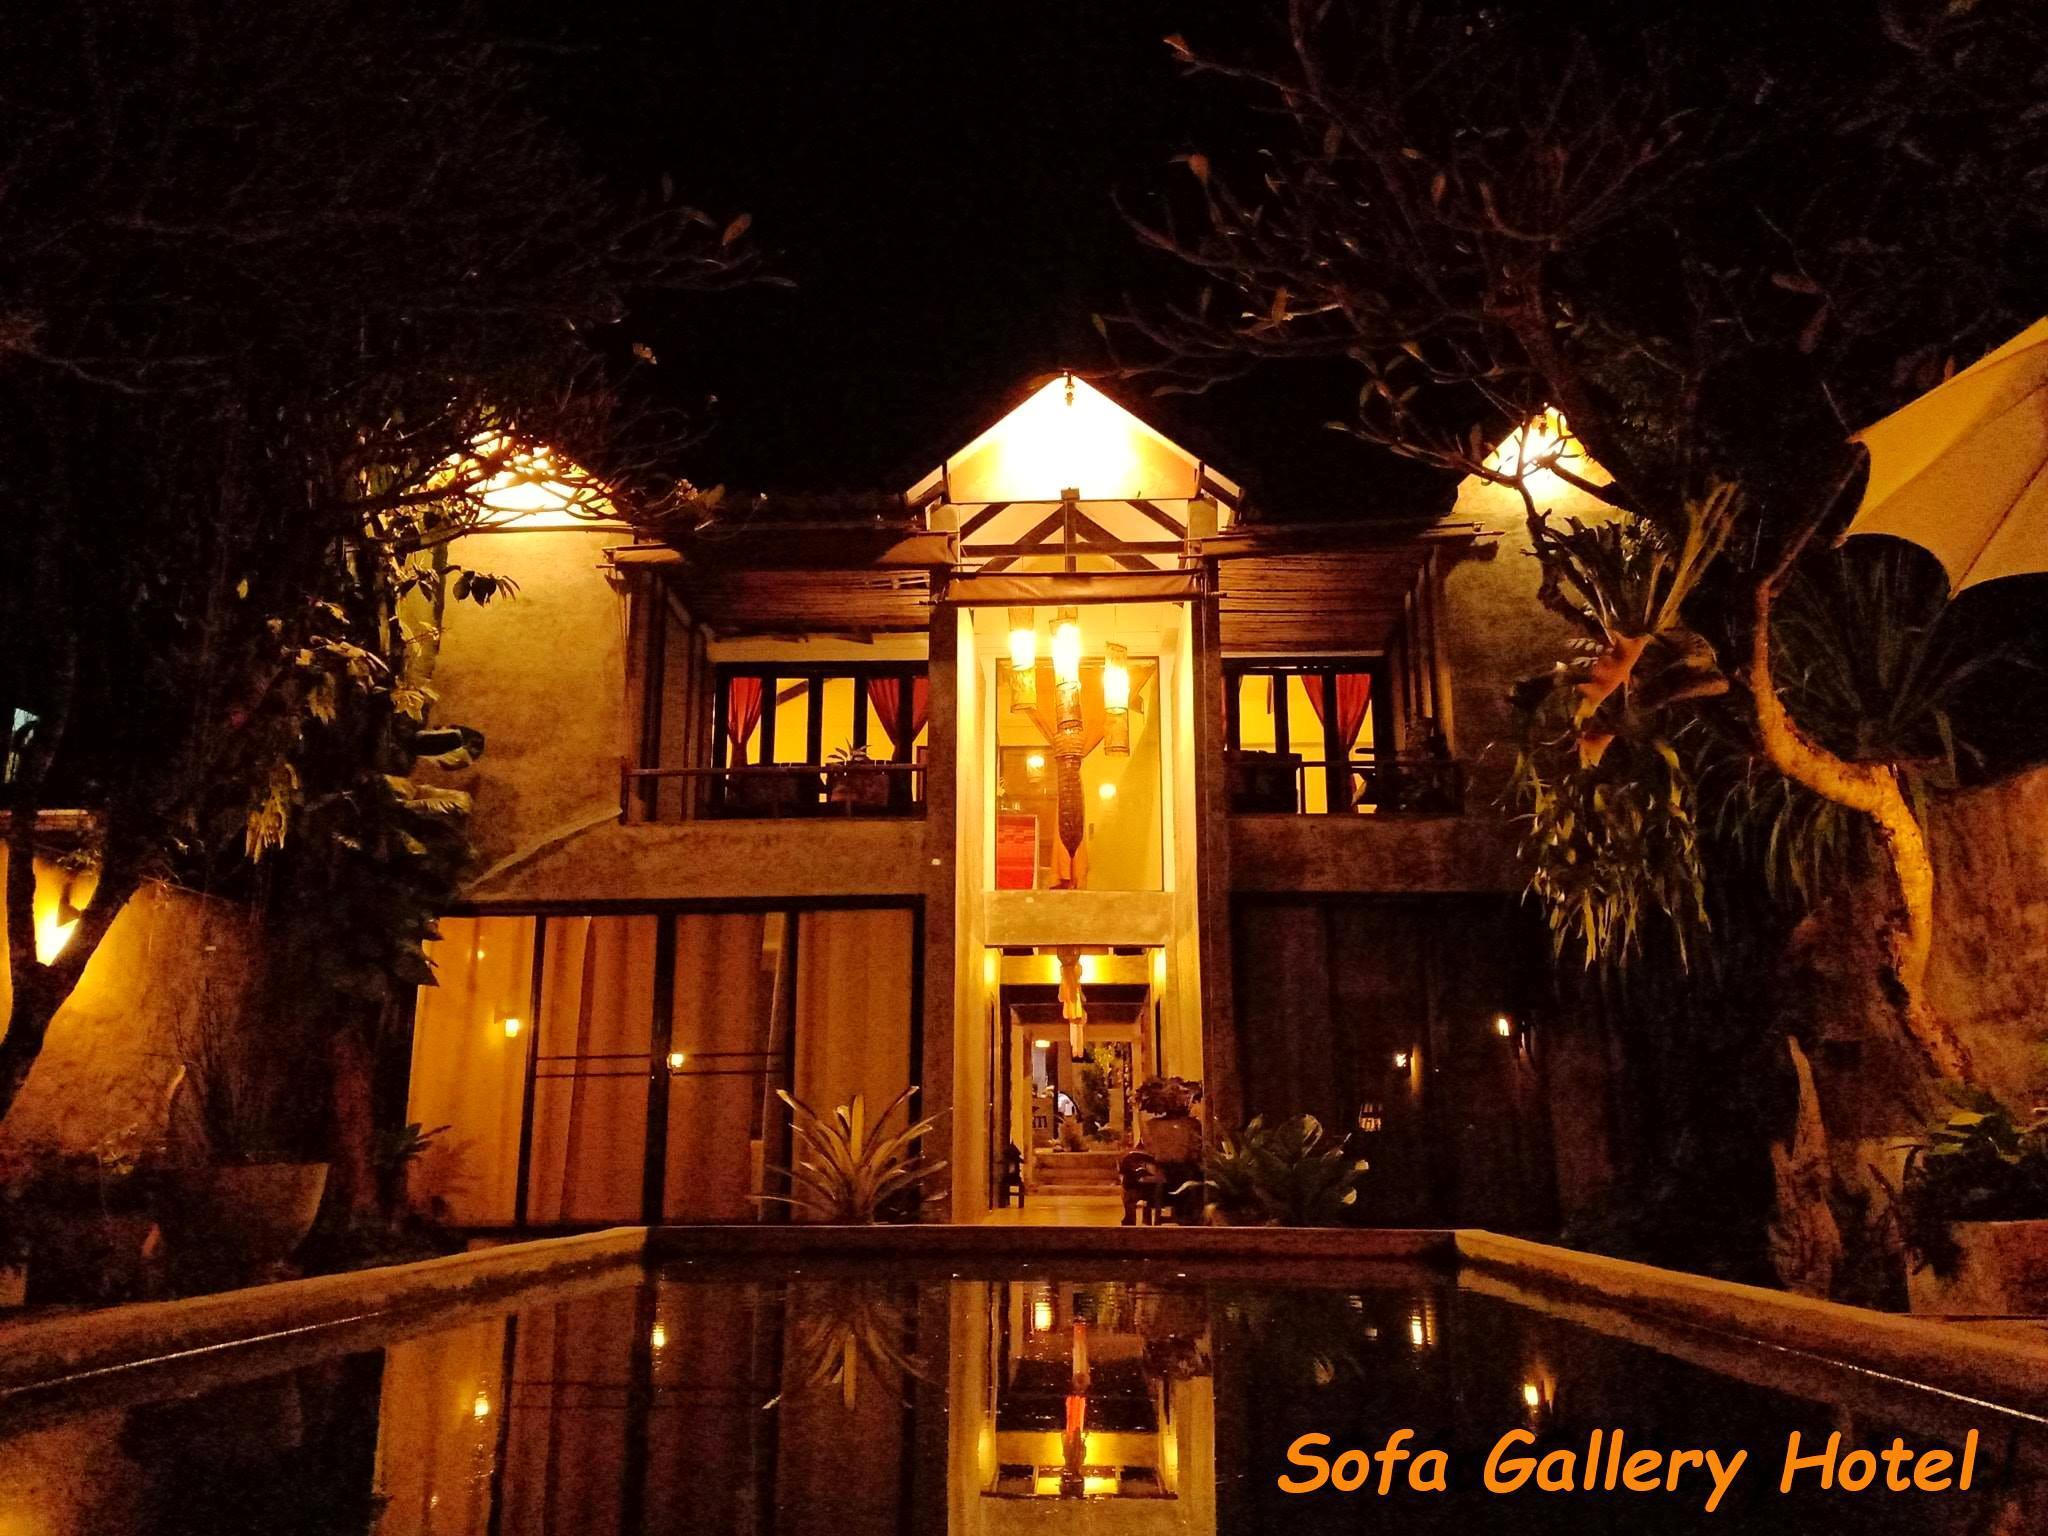 Sofa Gallery Hotel 1